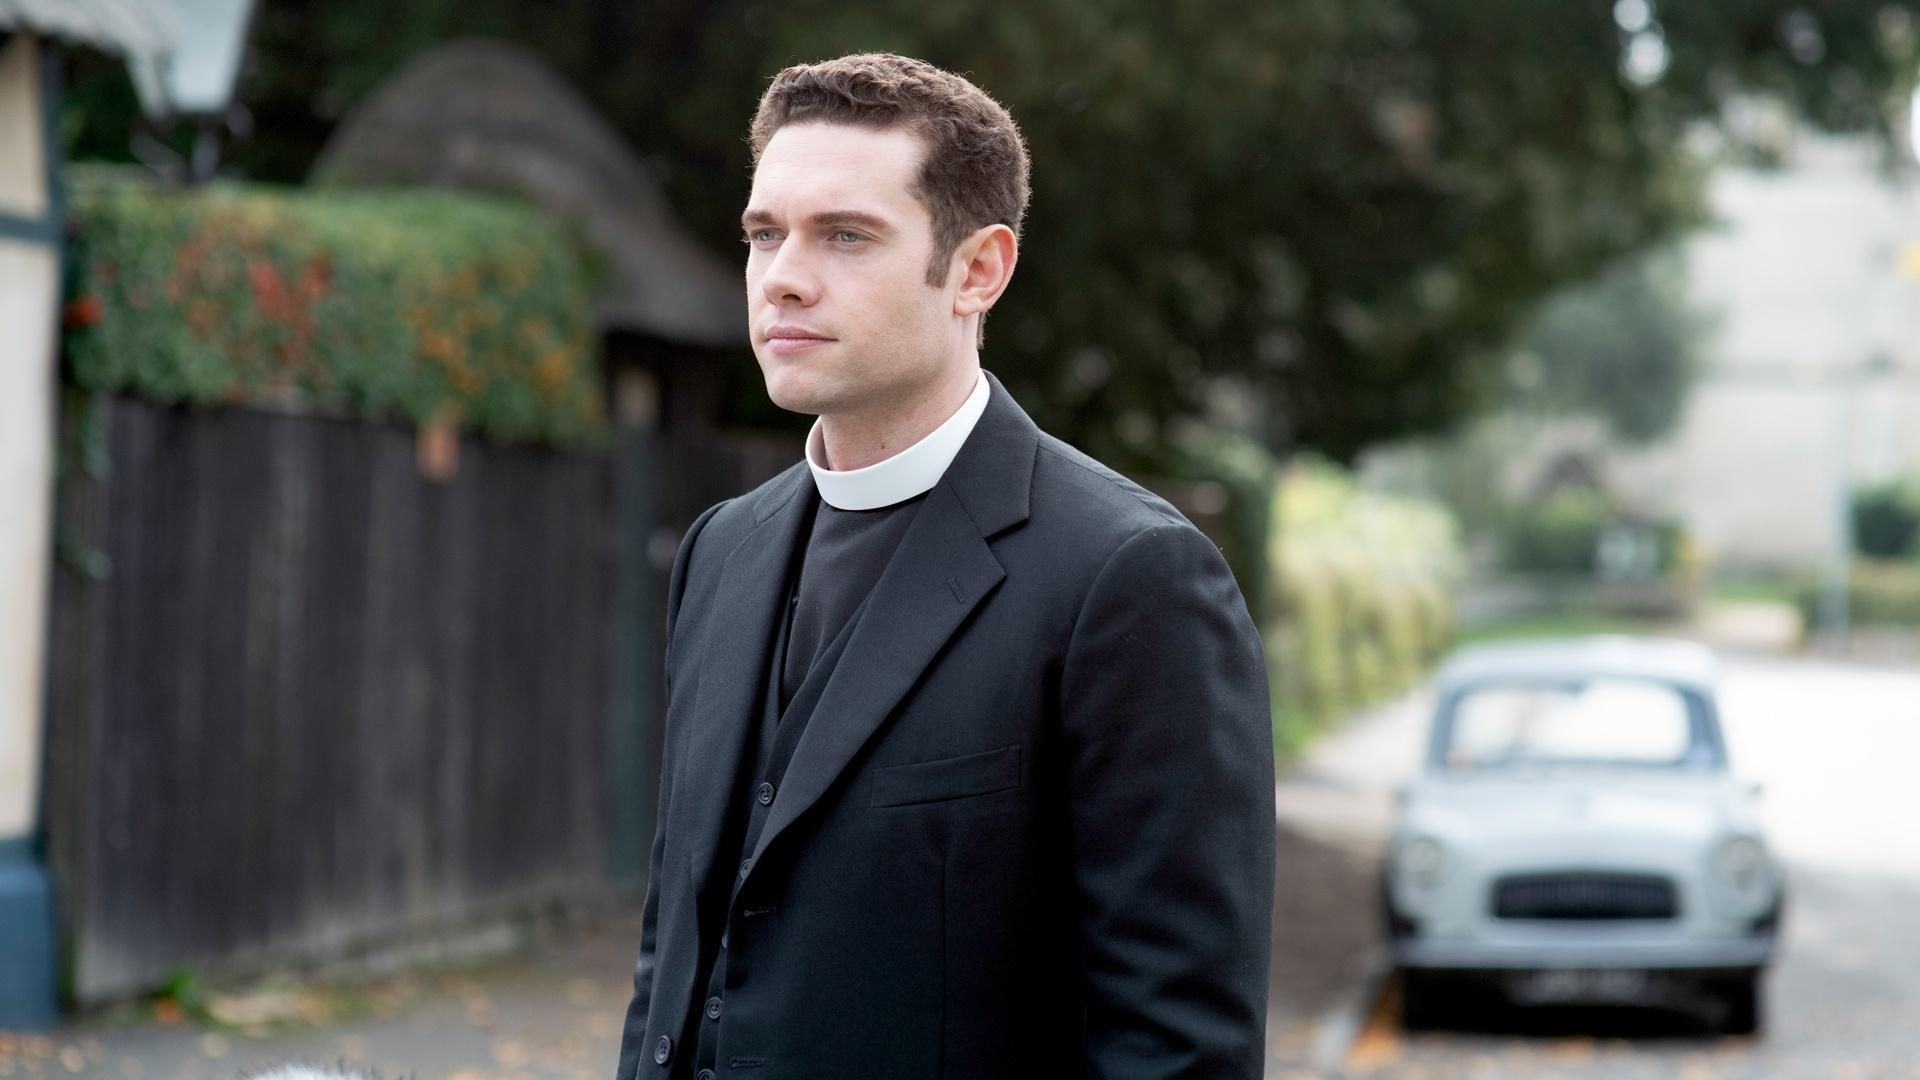 Tom Brittney as Rev. Will Davenport, standing on a quiet street